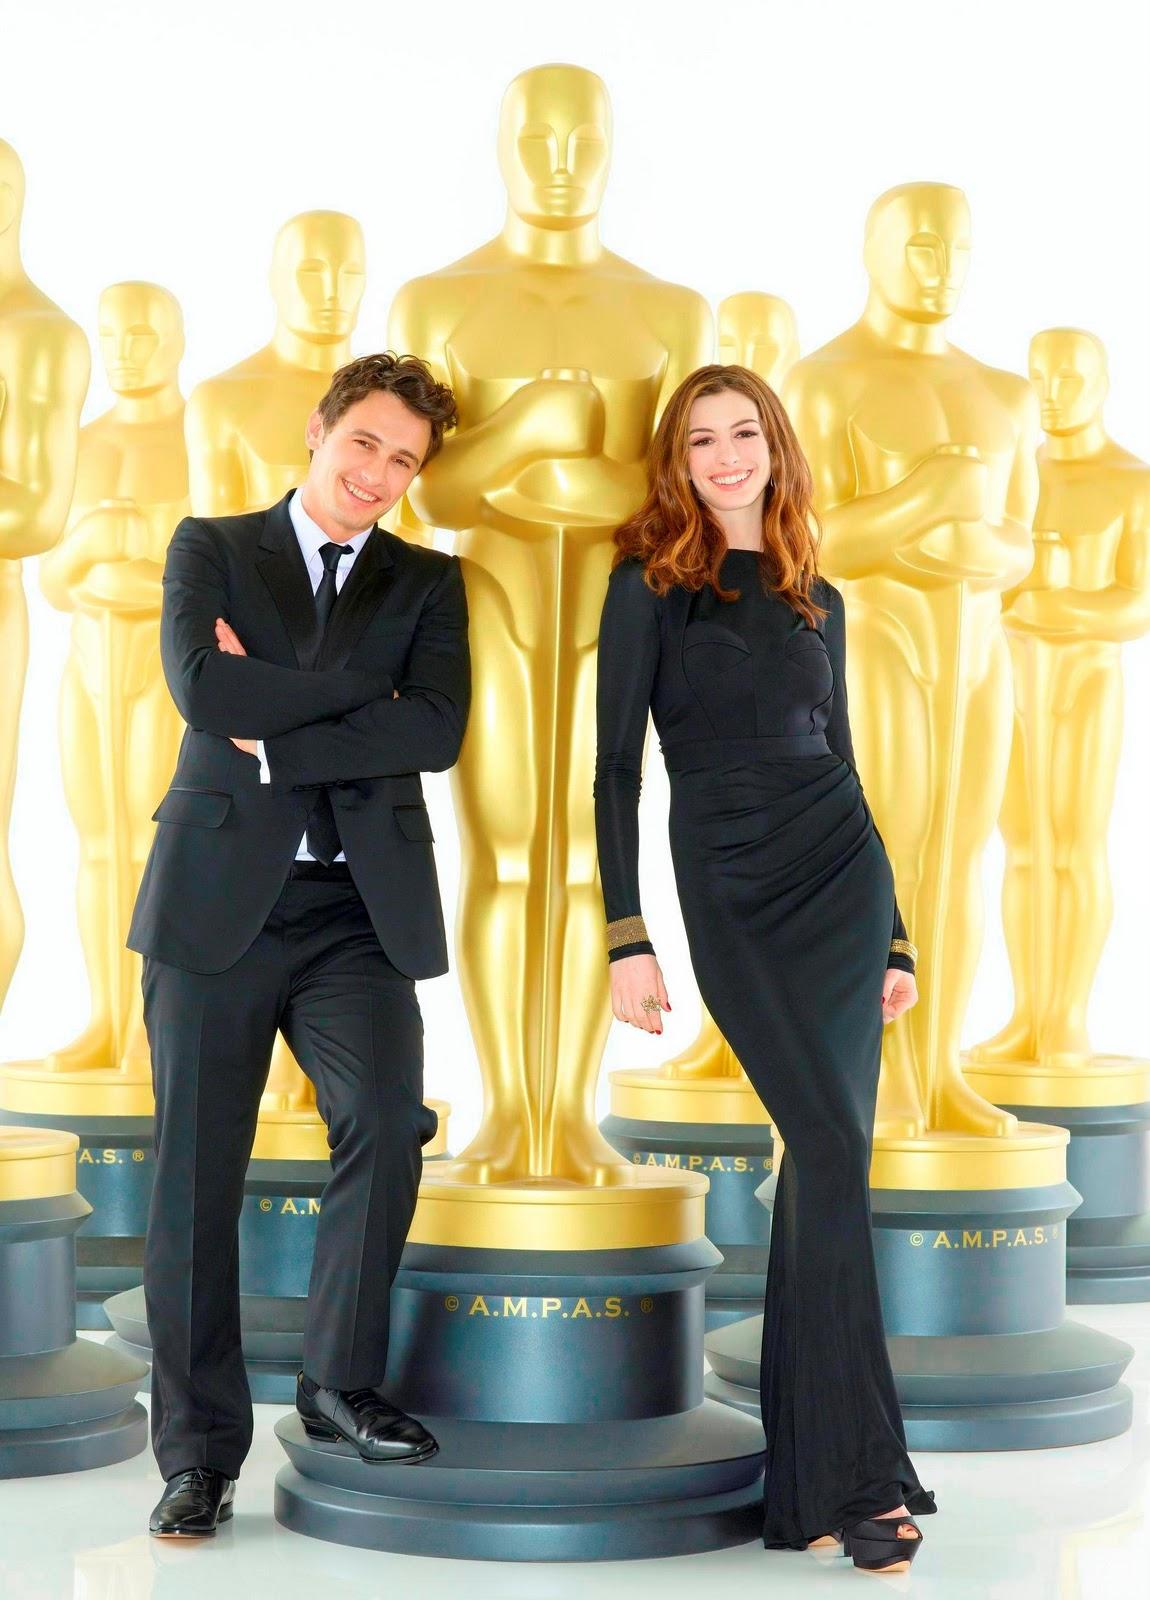 http://1.bp.blogspot.com/-kUbtteAn3Y4/TWfho6amS8I/AAAAAAAAAM8/04-lpHR3YW0/s1600/83rd+Academy+Awards+2011+Oscars_James+Franco+Anne+Hathaway+Bob+D%2527Amico+slash+ABC+003.jpg